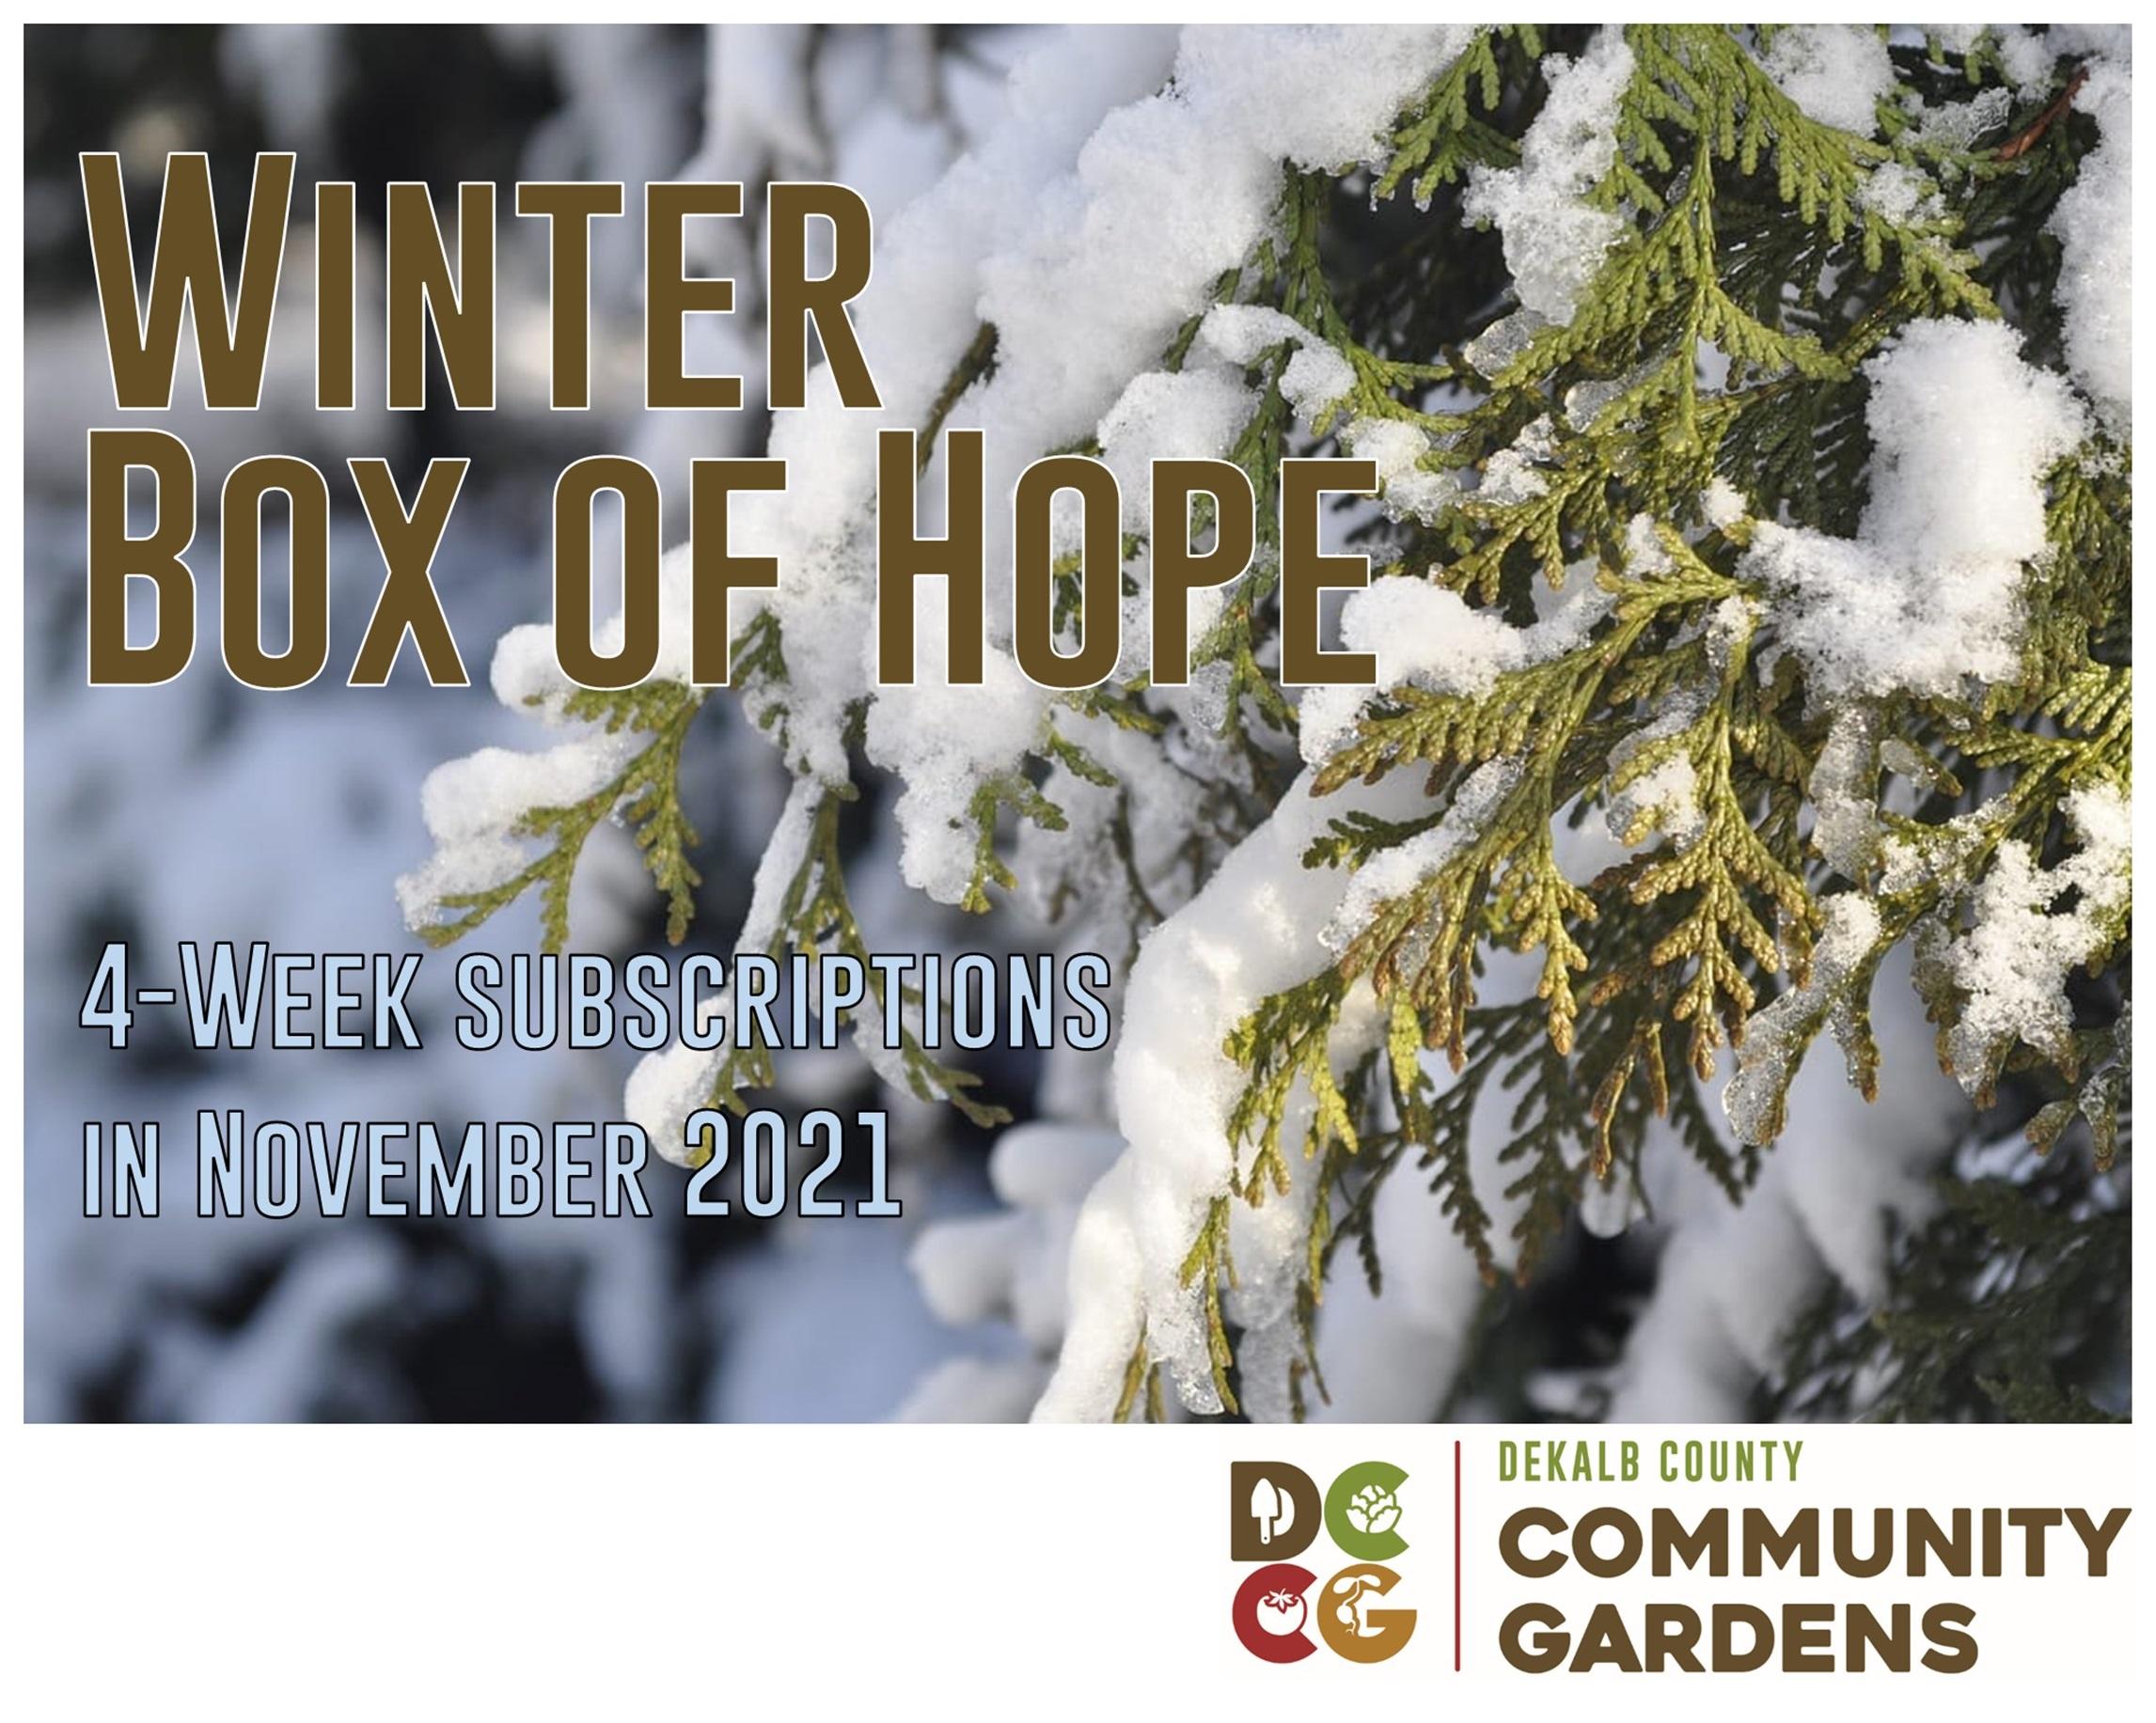 Winter Box of Hope